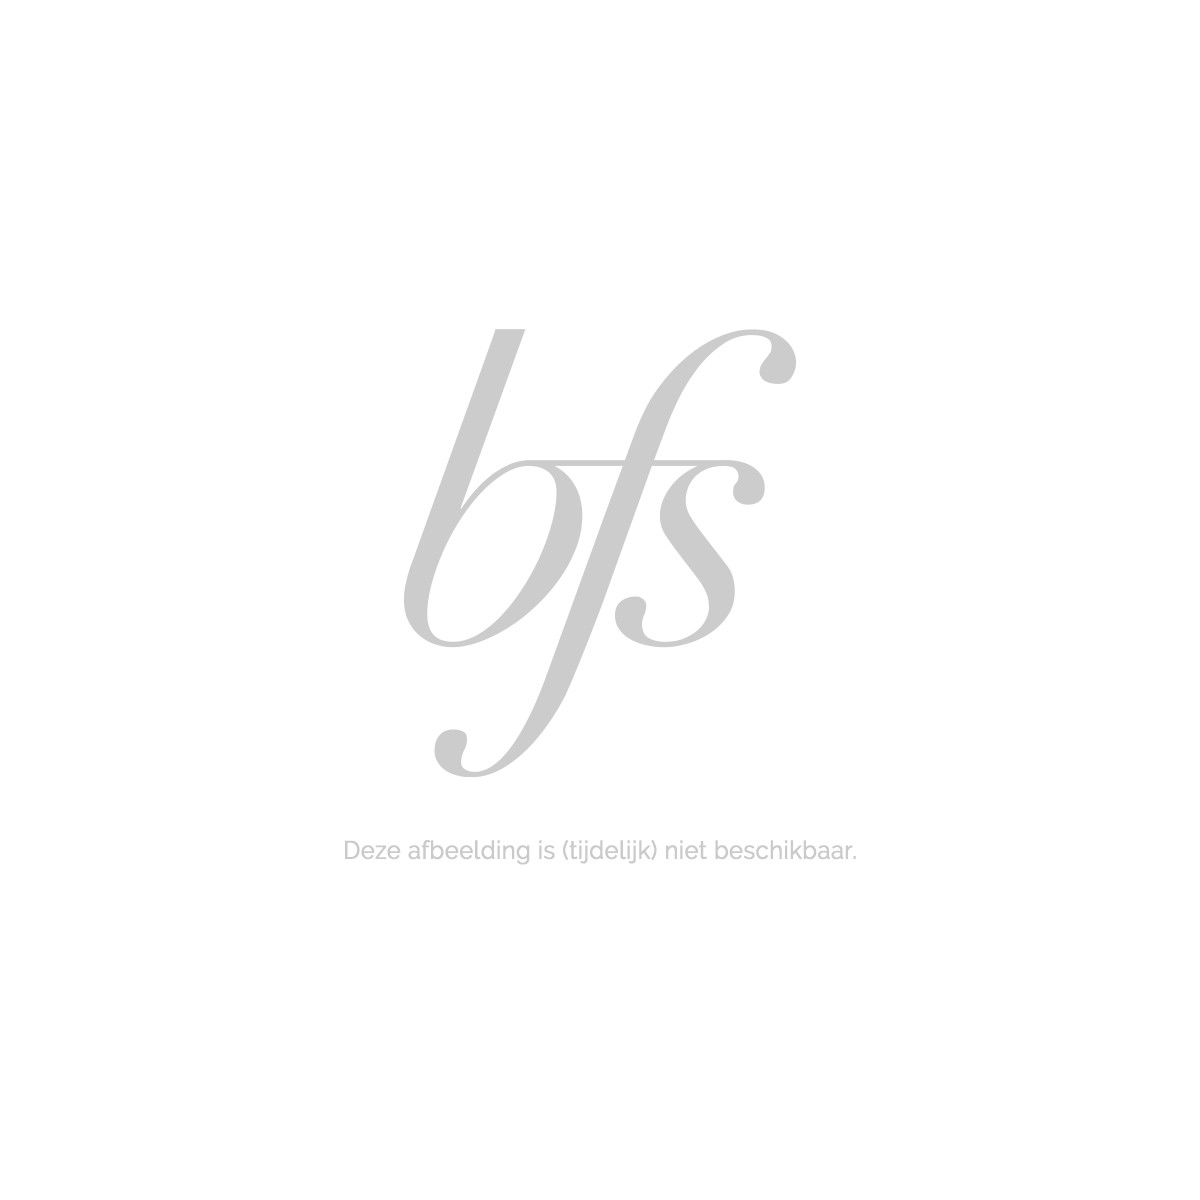 Clinique Anti-Blemish Solutions Liquid Make-Up #04 Fresh Vanilla 30 Ml